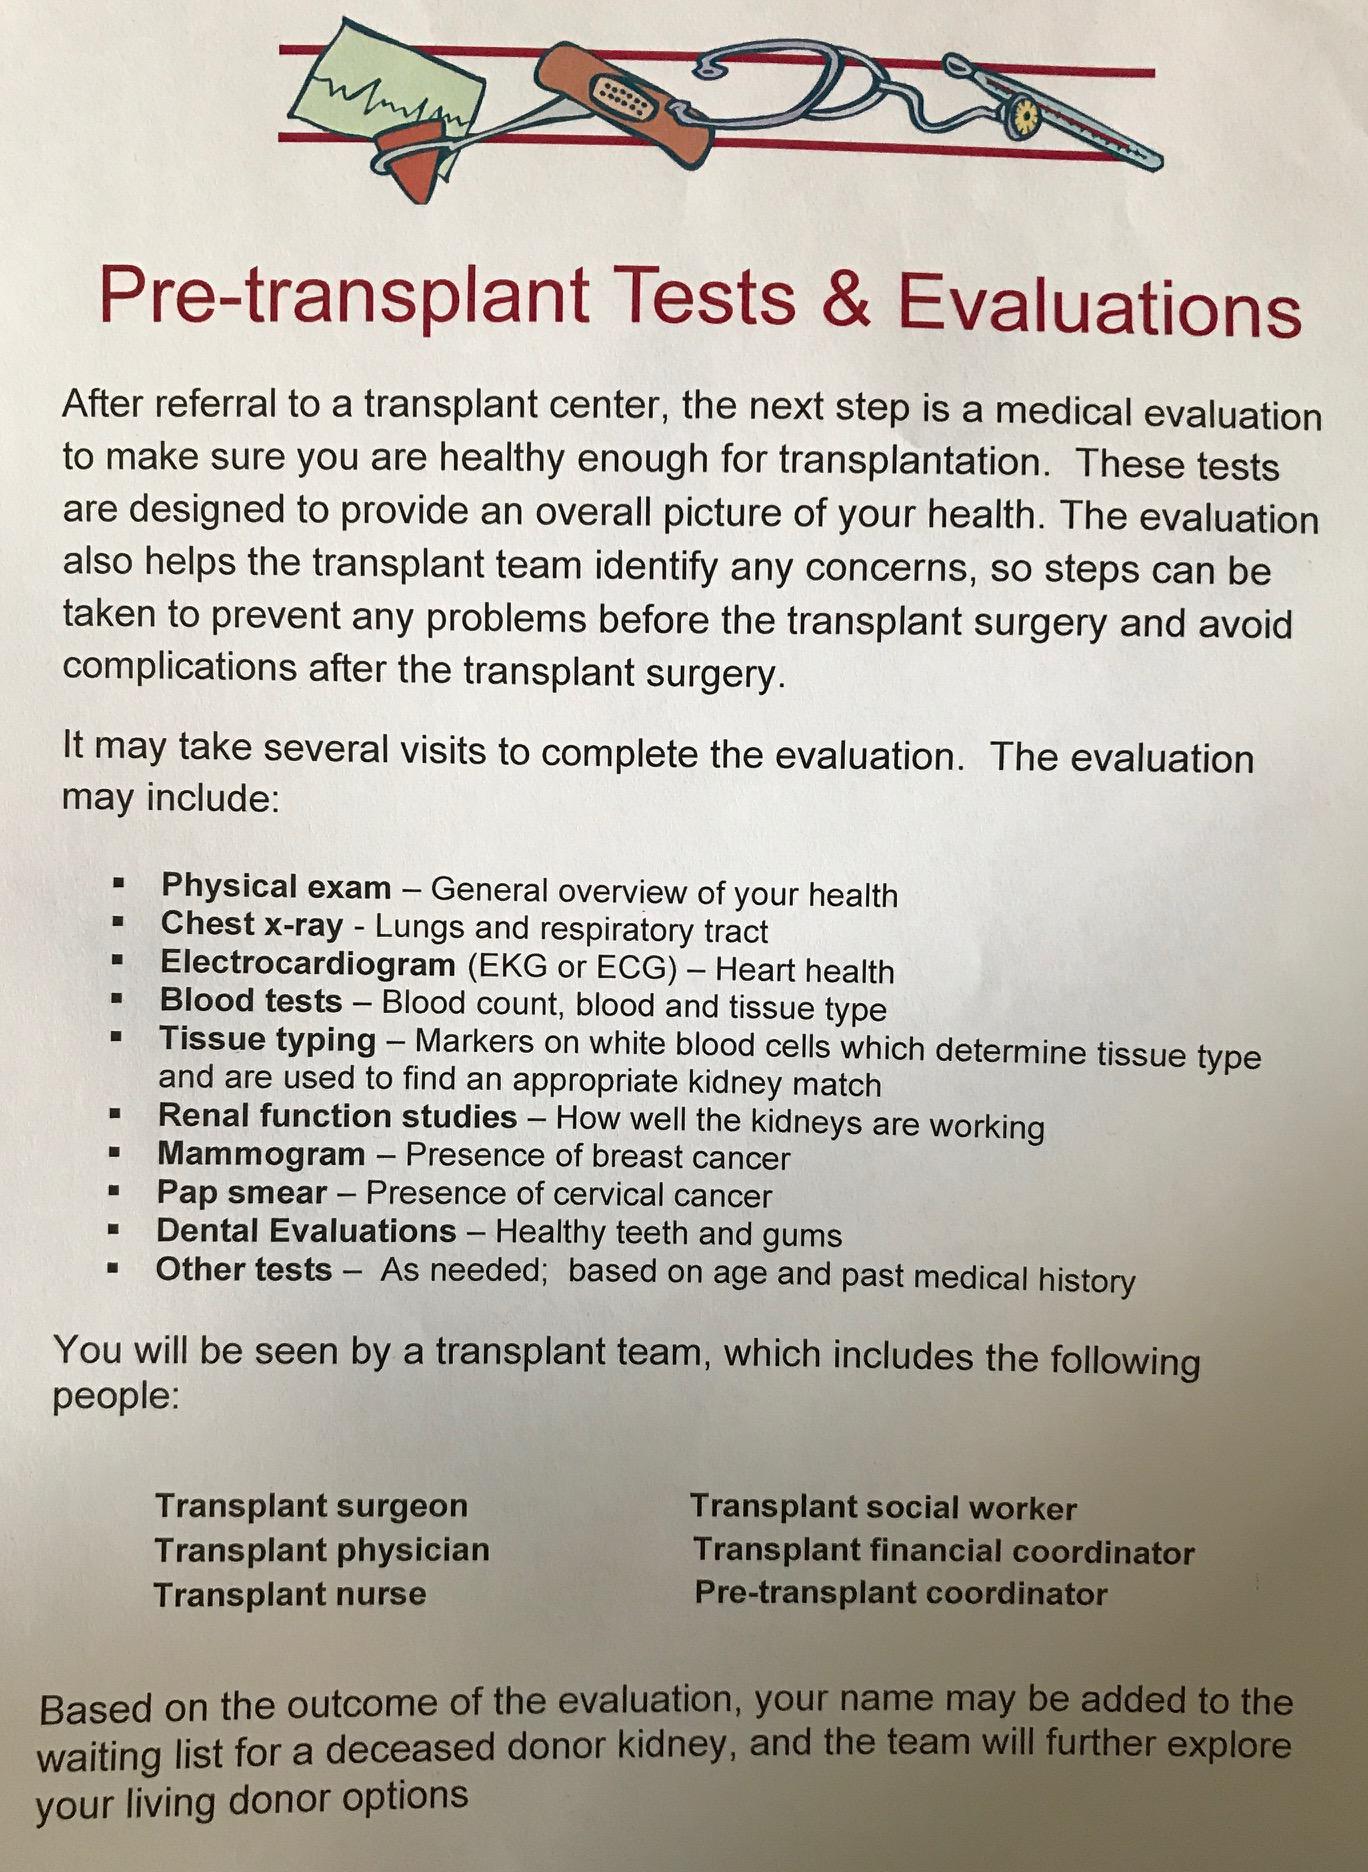 pretransplant.jpg